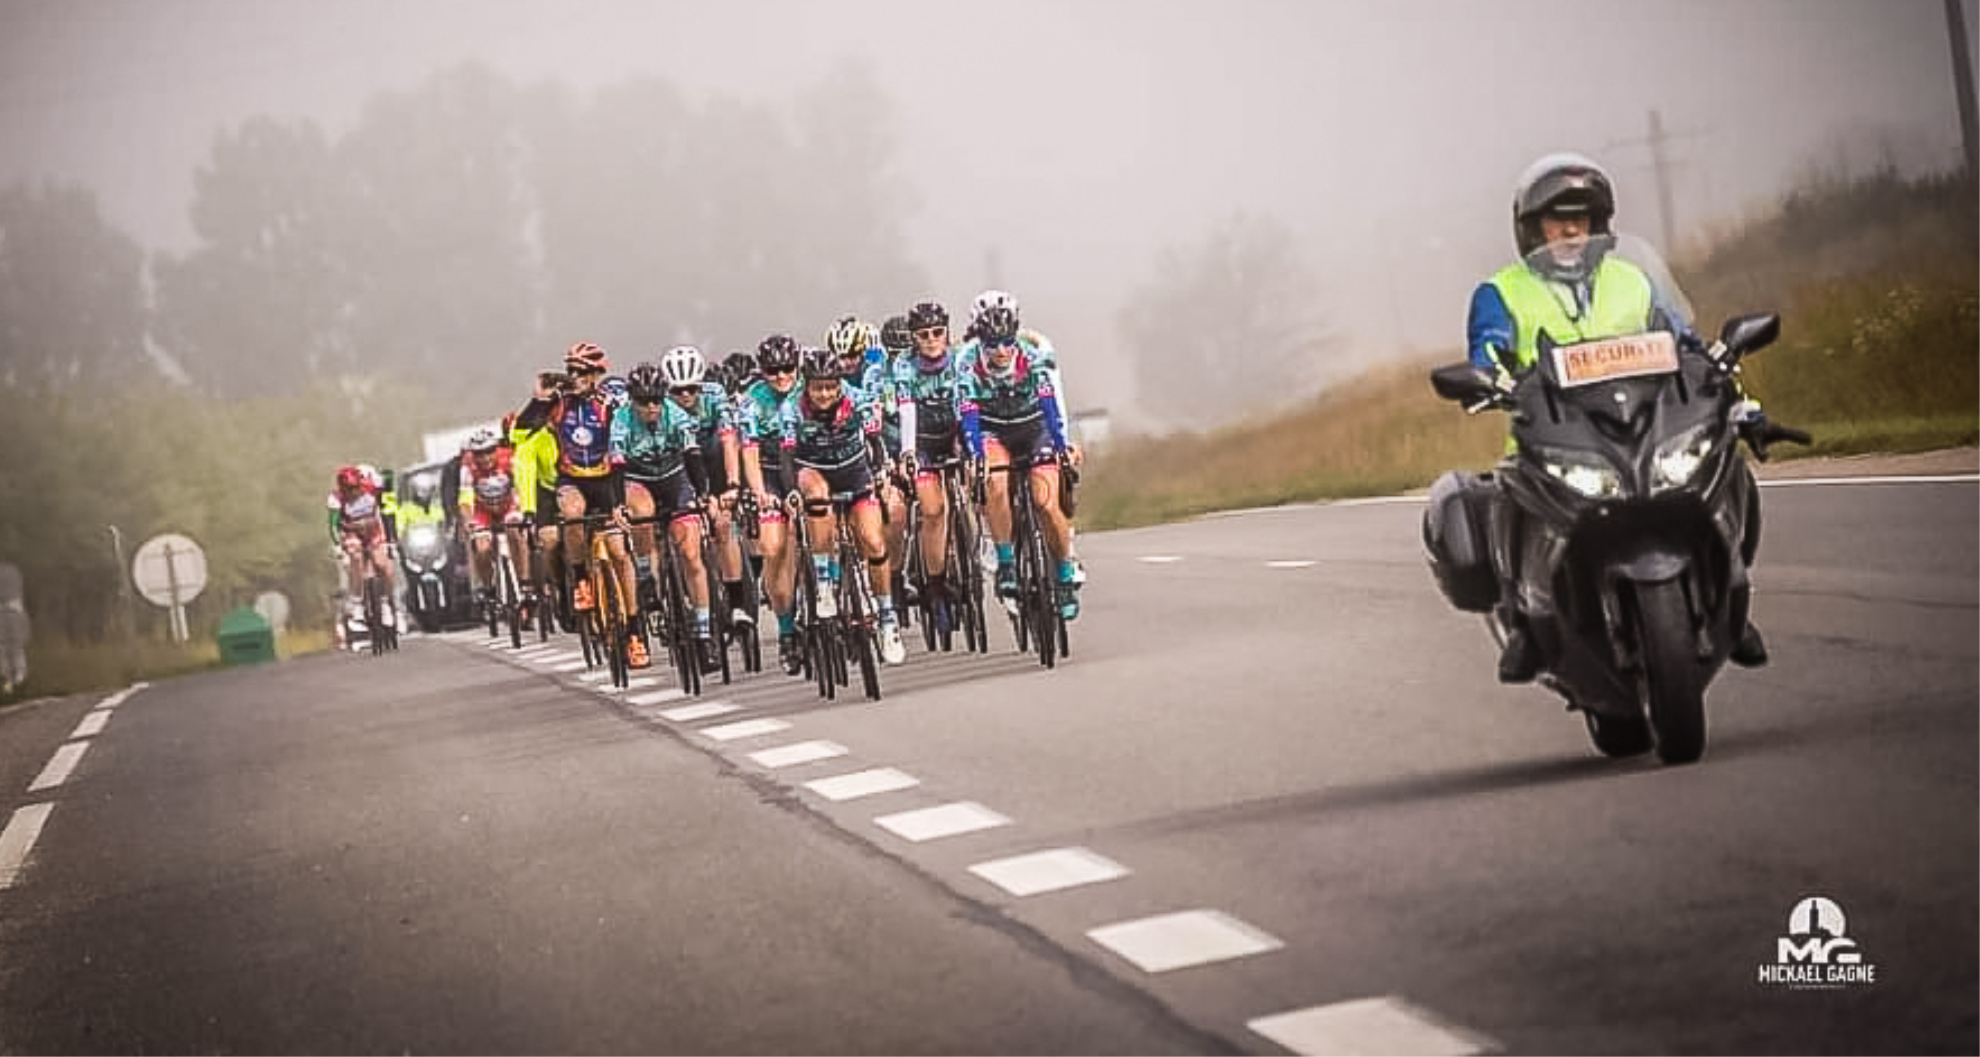 coureuses cyclistes